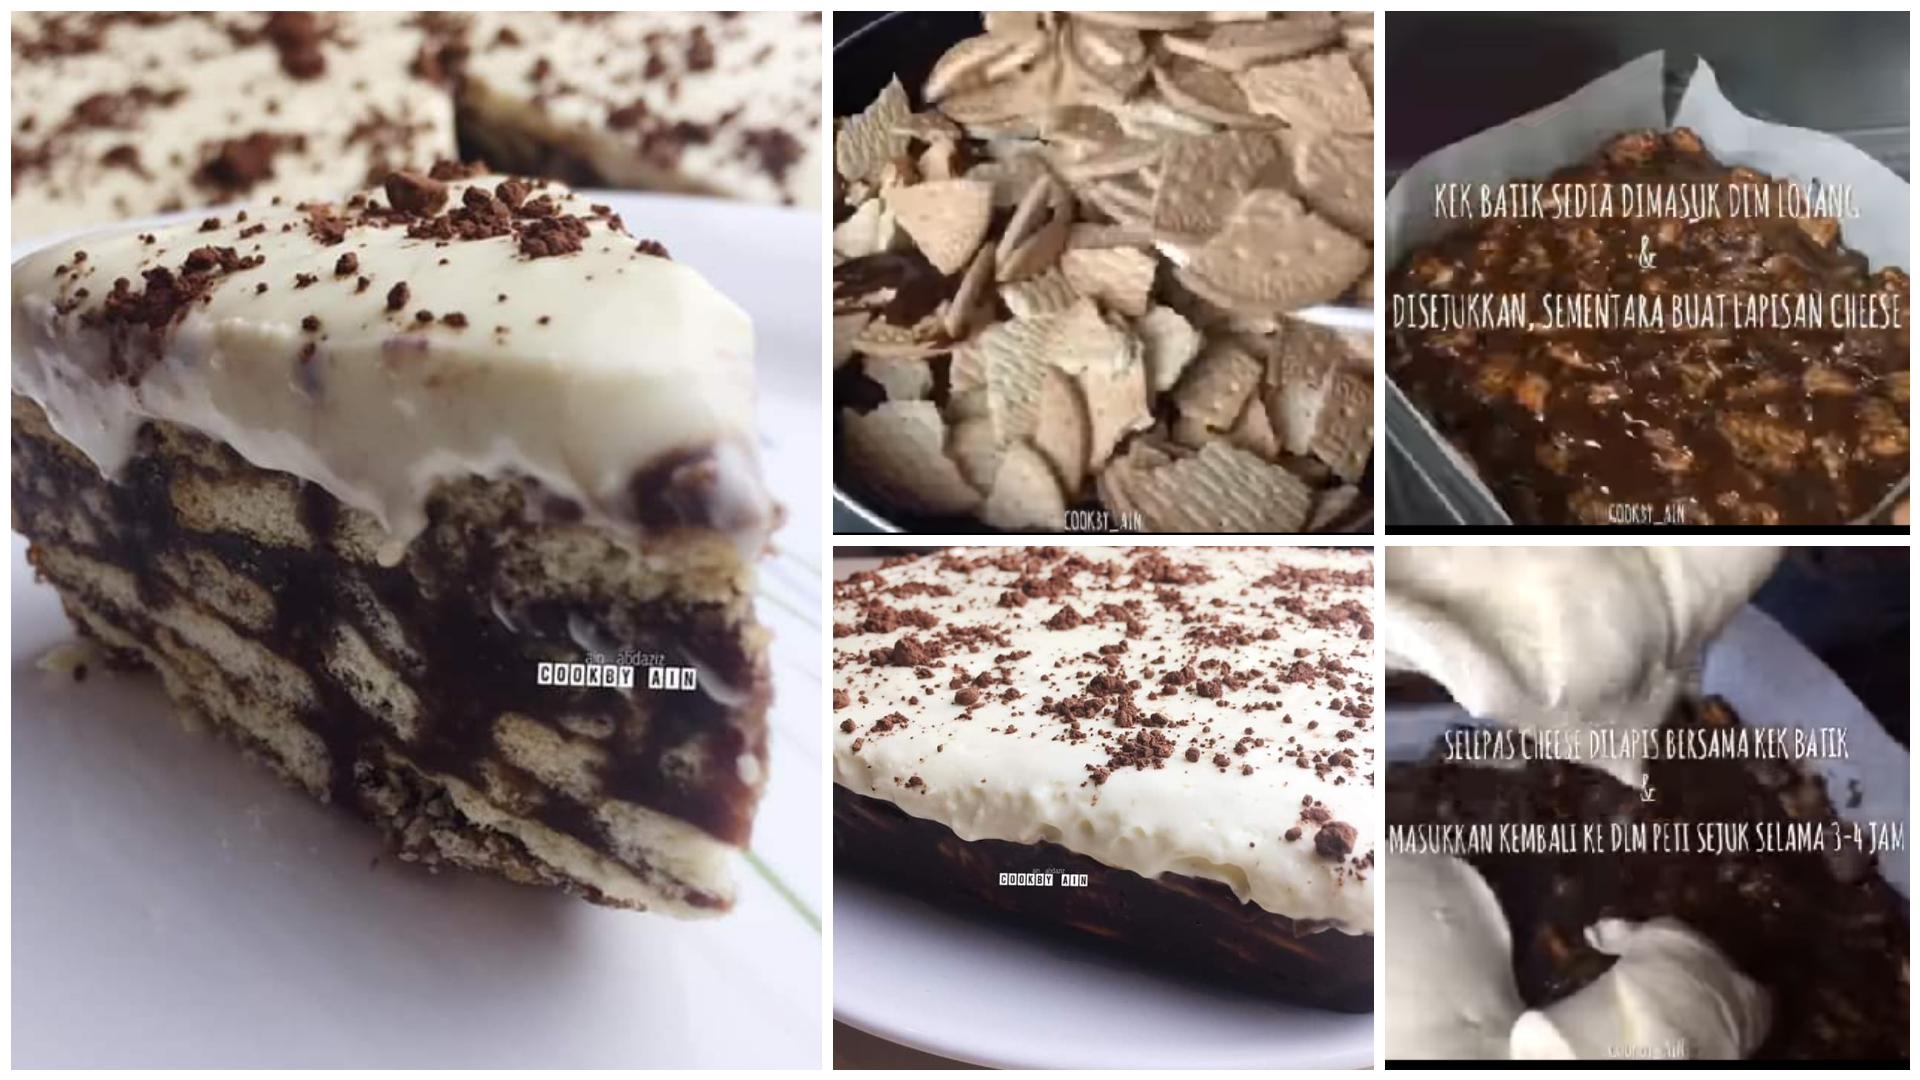 Resepi Kek Batik Special Bubuh Topping Cheese Lagi Sedap